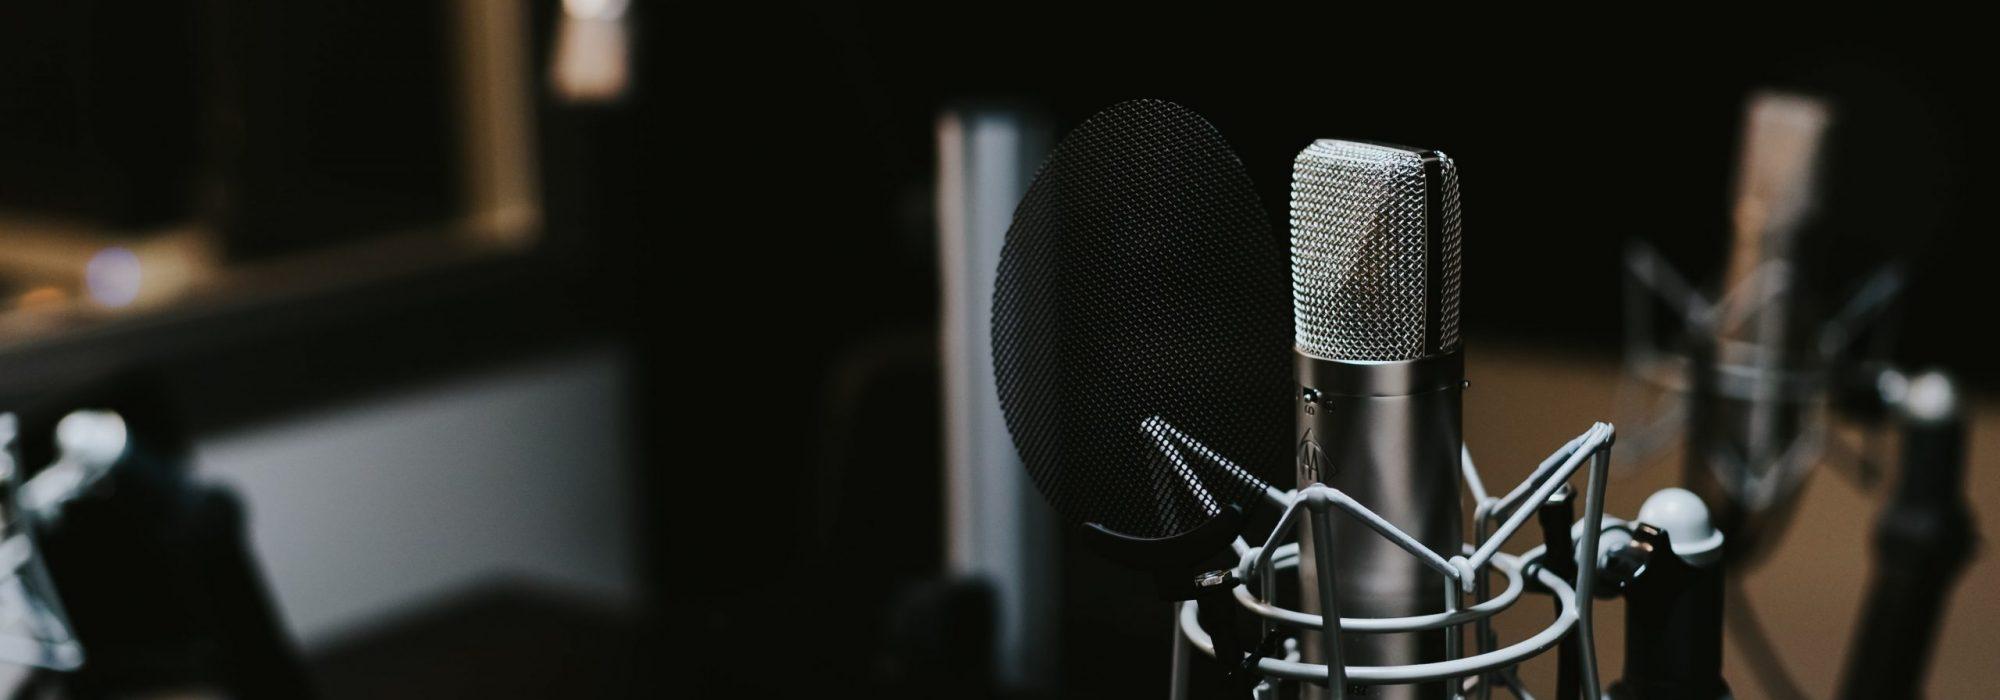 podcastjonathan-velasquez-c1zn57gfdb0-unsplash